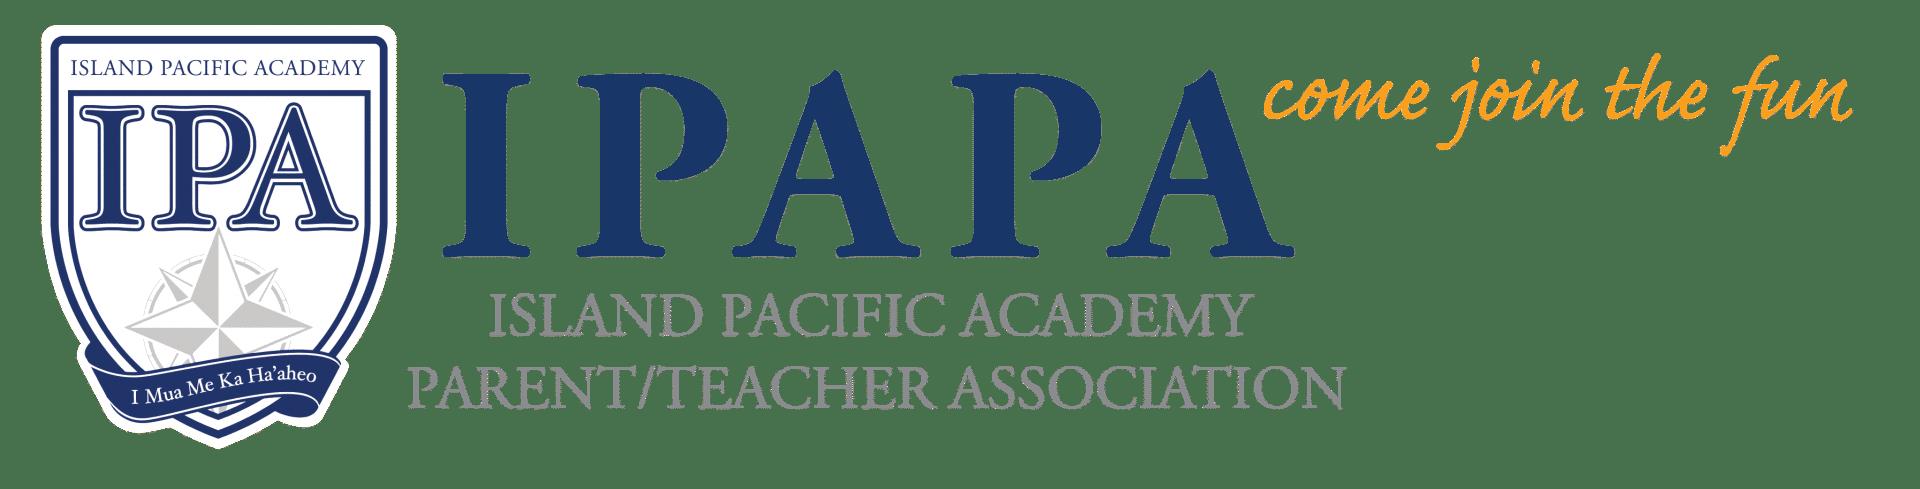 2019-2020_IPA_ipapa_logo_light-bkgd